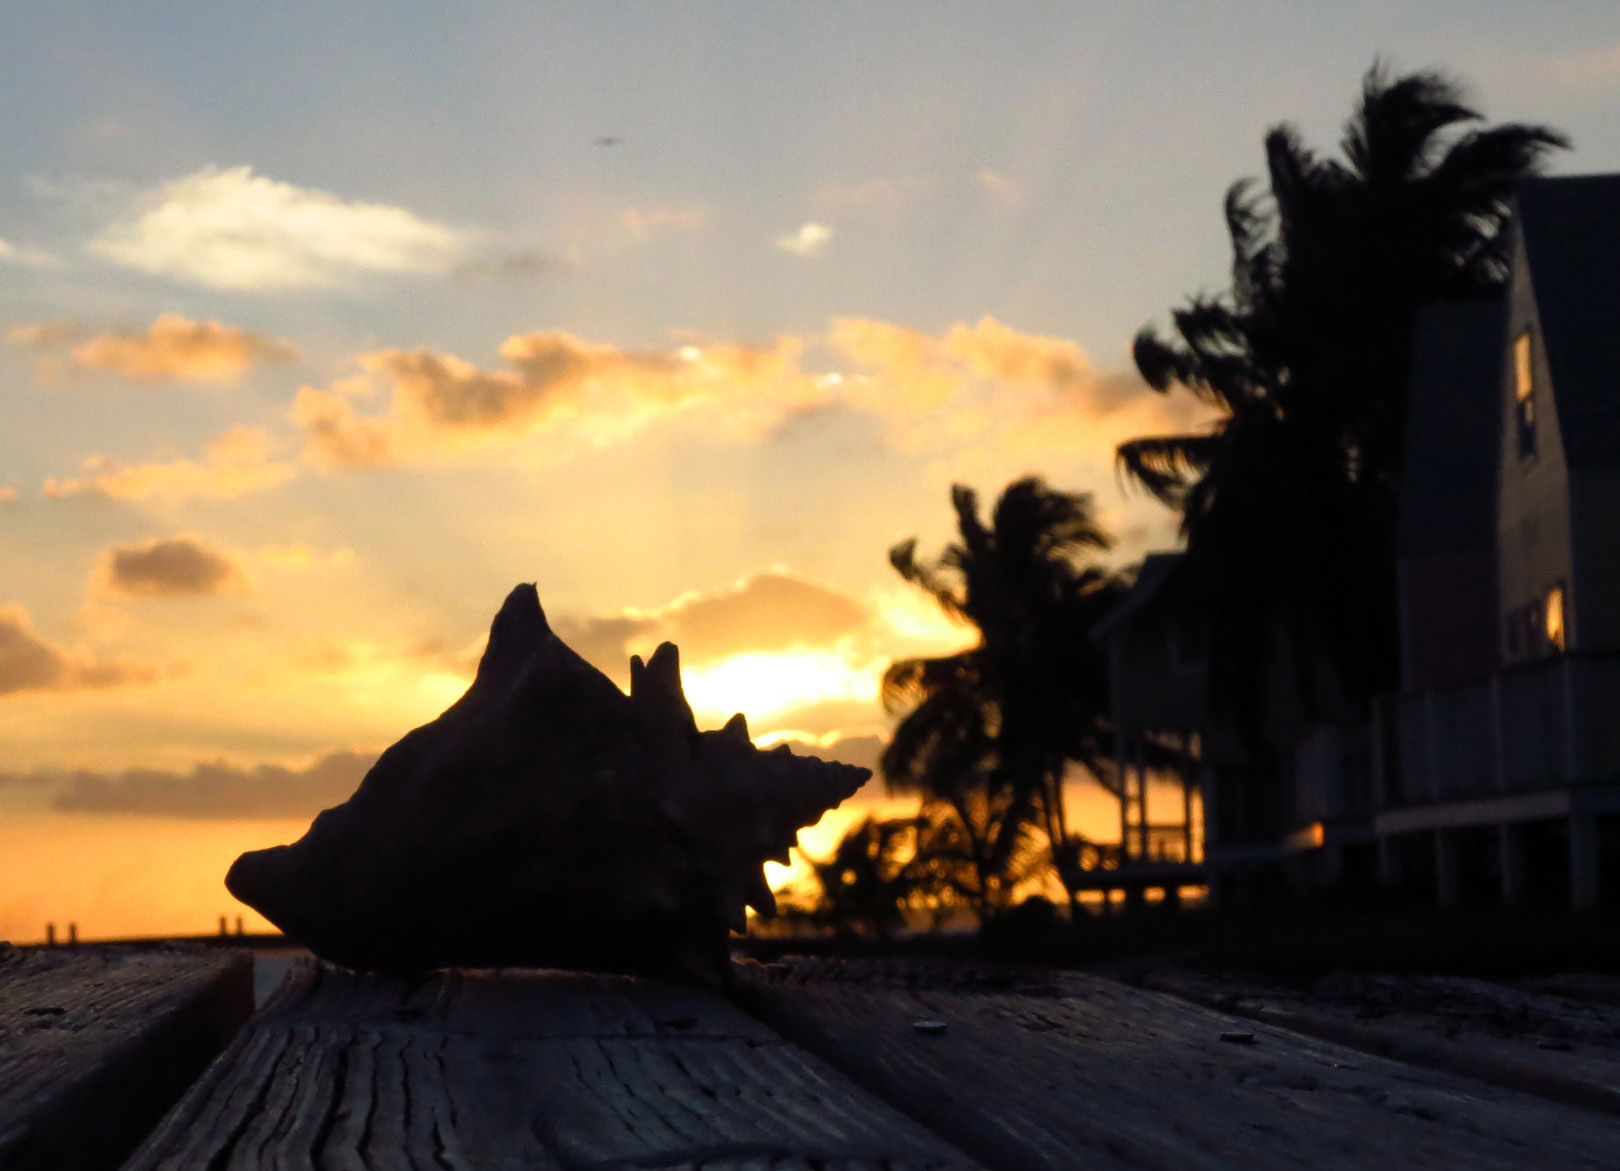 Sunset - Green Turtle Cay, Bahamas